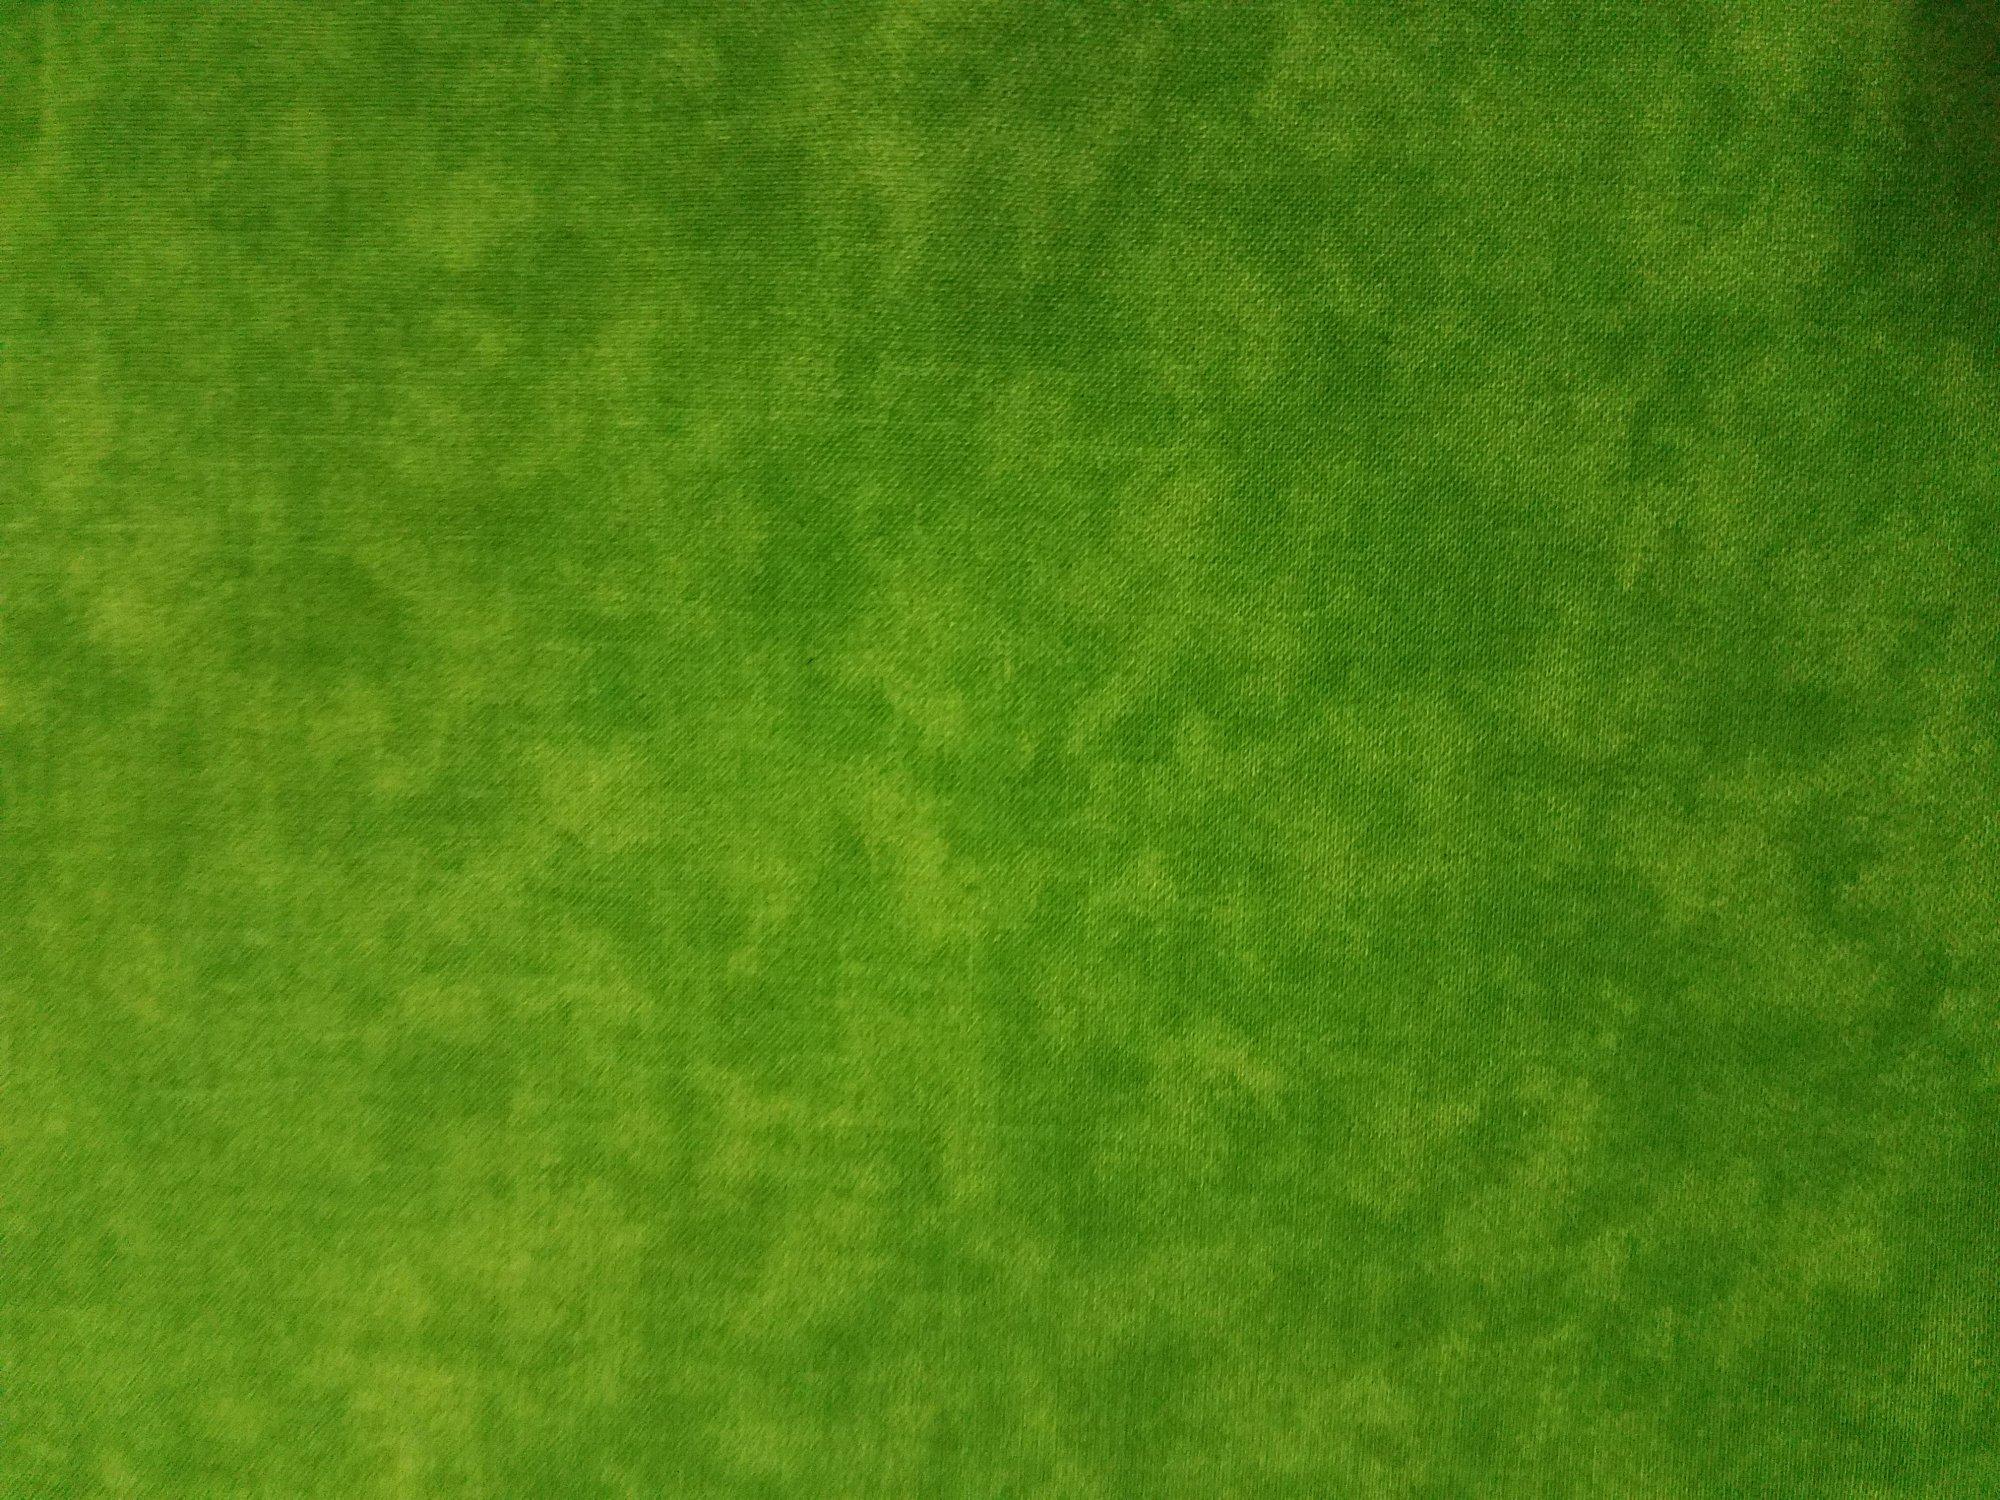 606 Choice Blenders Green